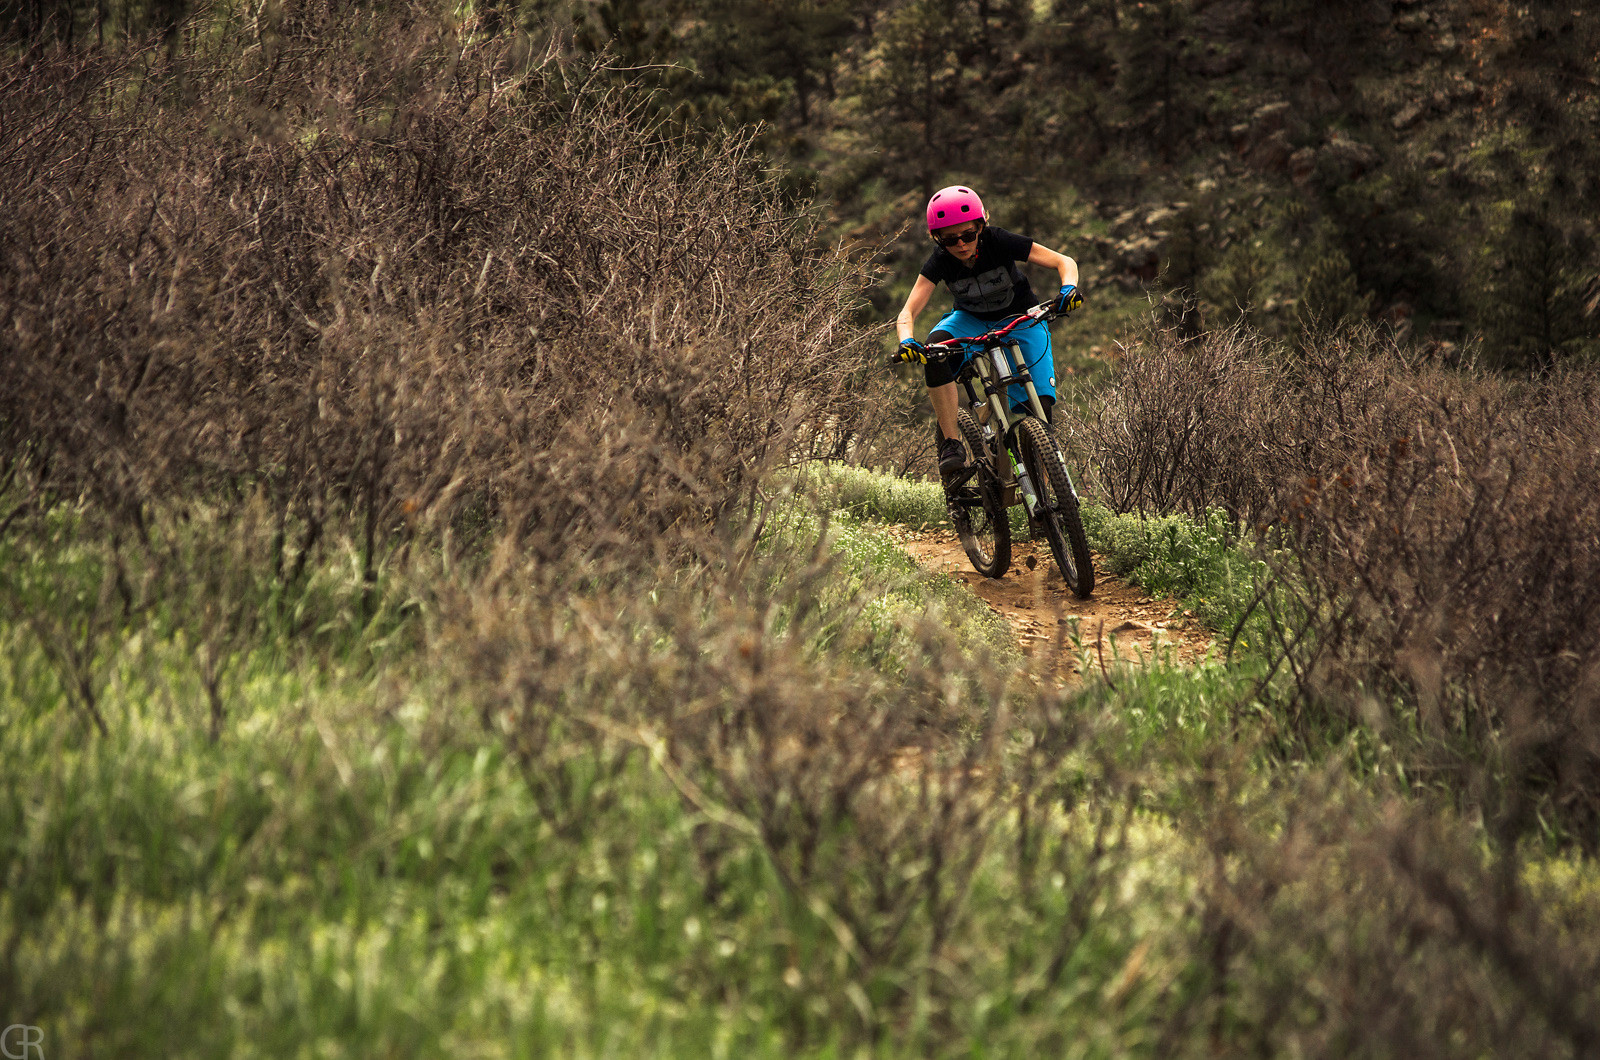 Picture Rock - rhiannon - Mountain Biking Pictures - Vital MTB